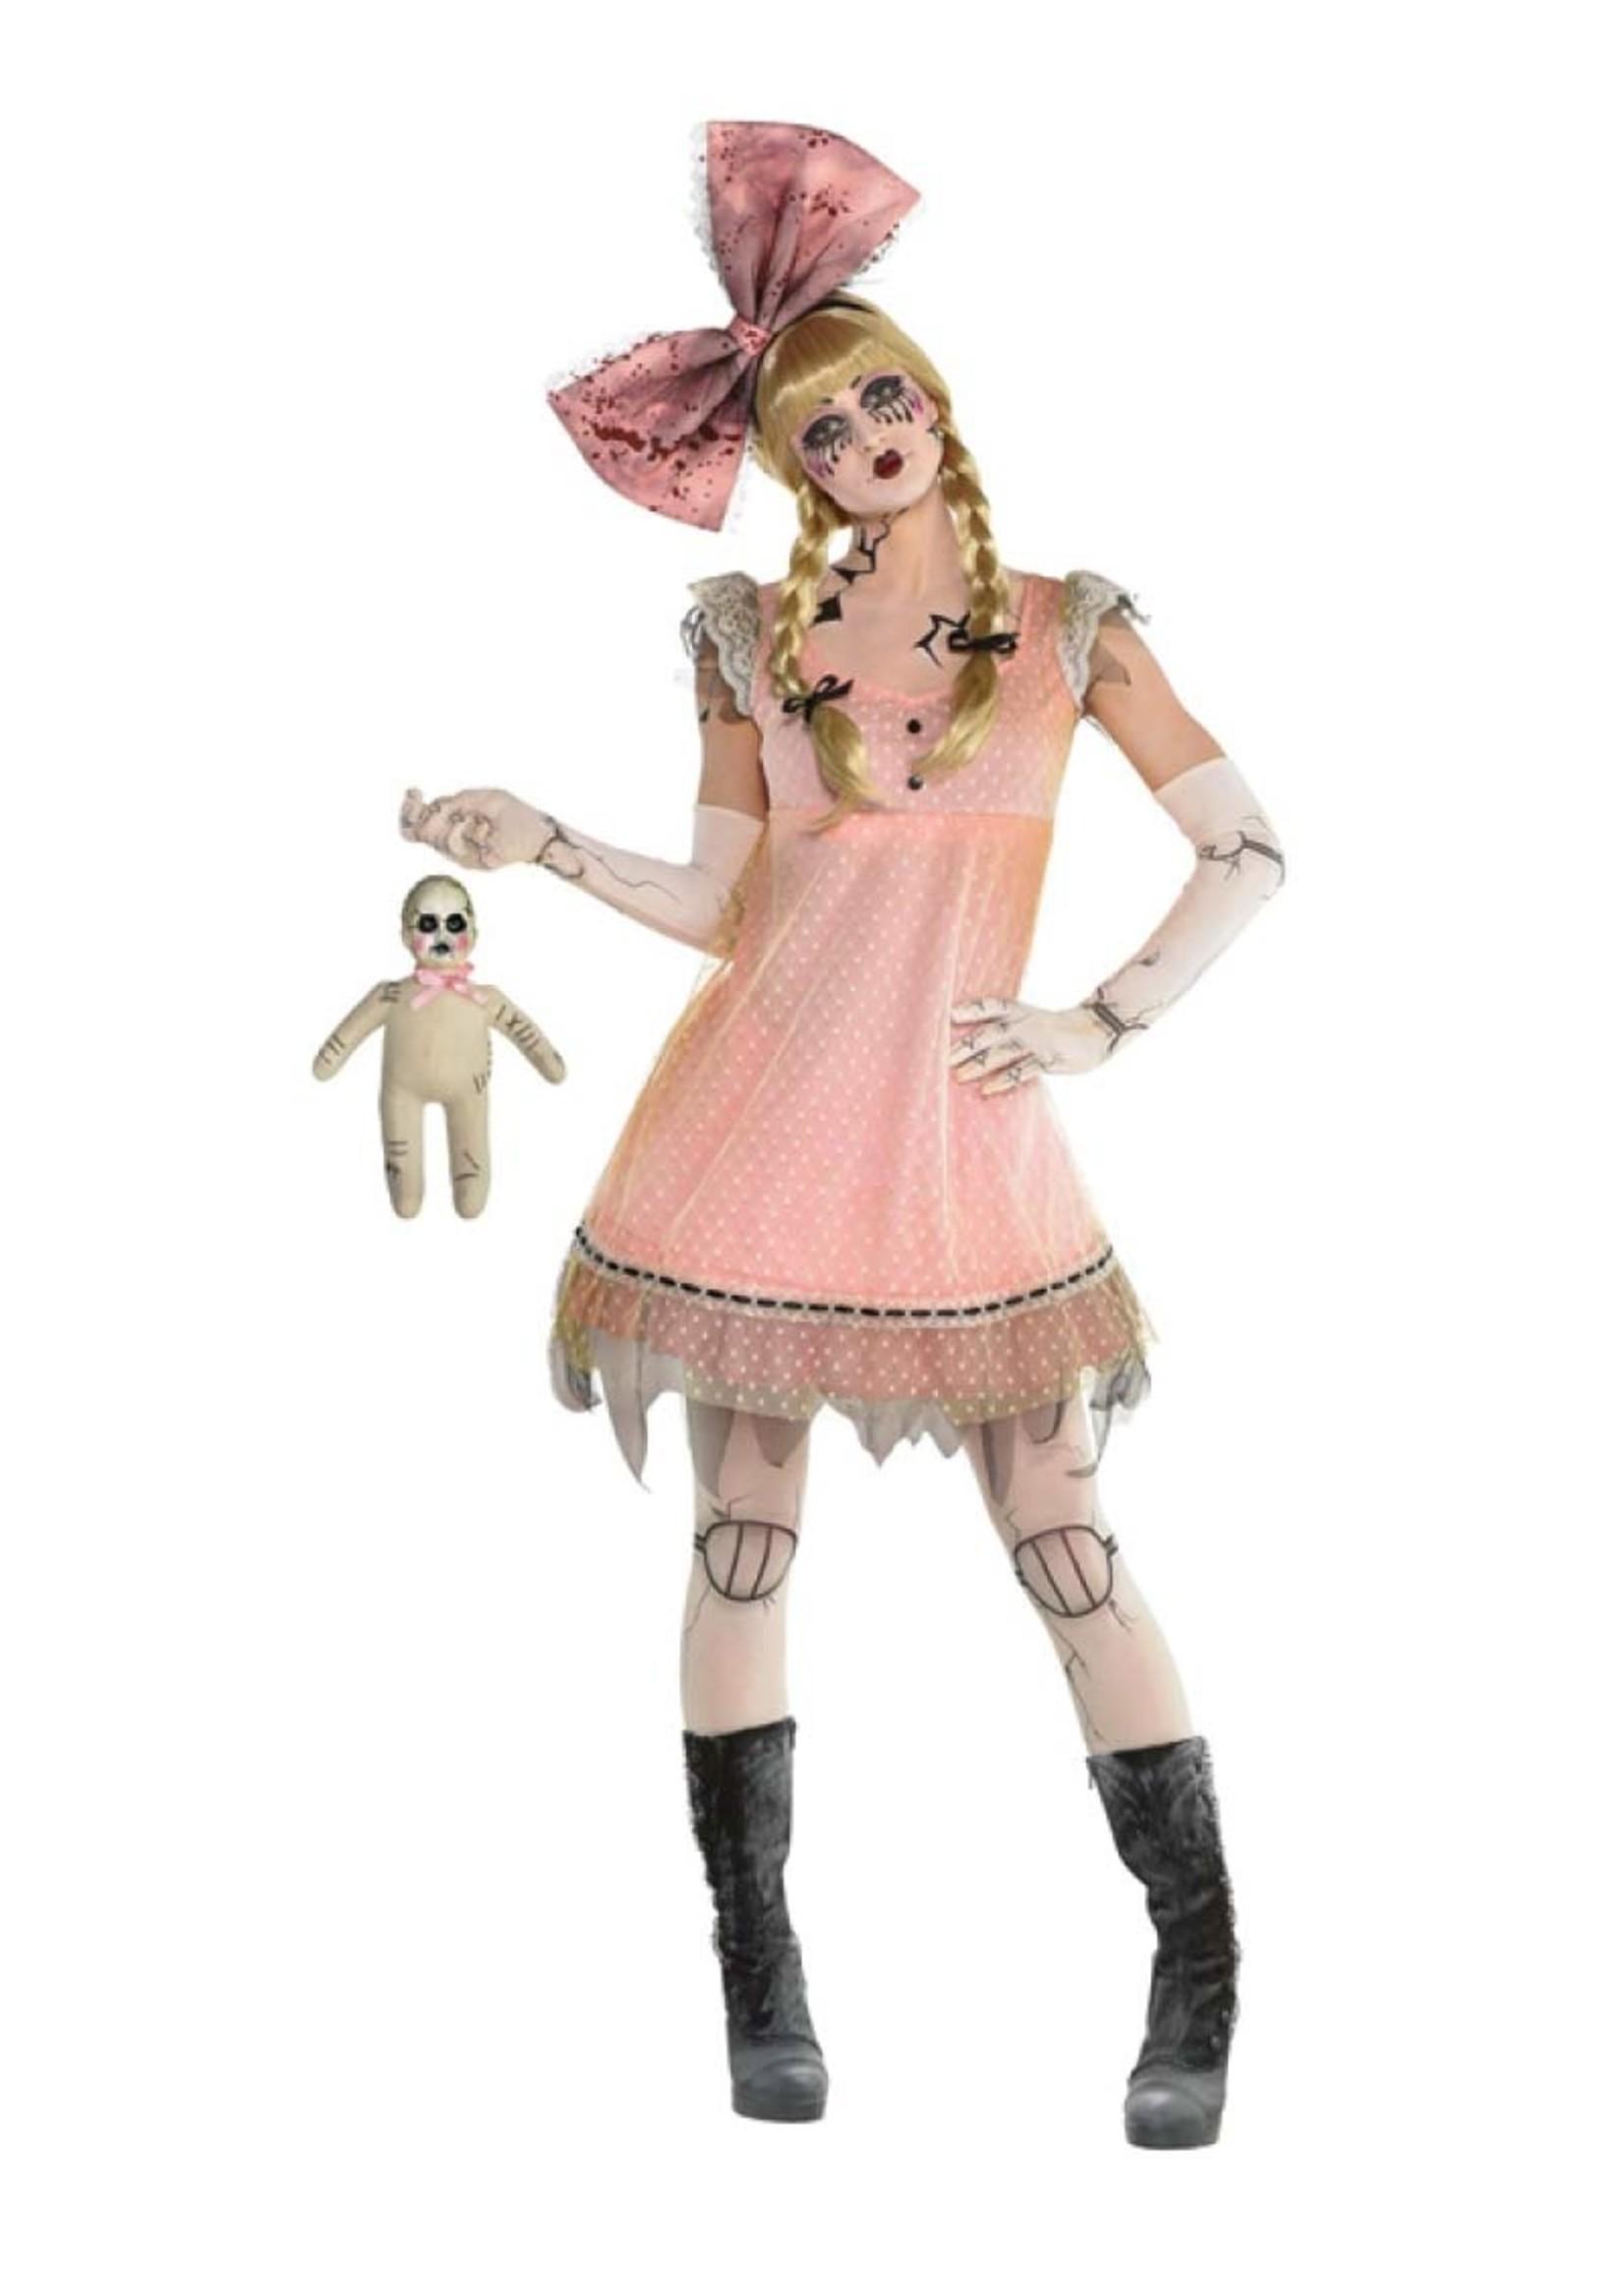 Creepy Doll Dress - Women's